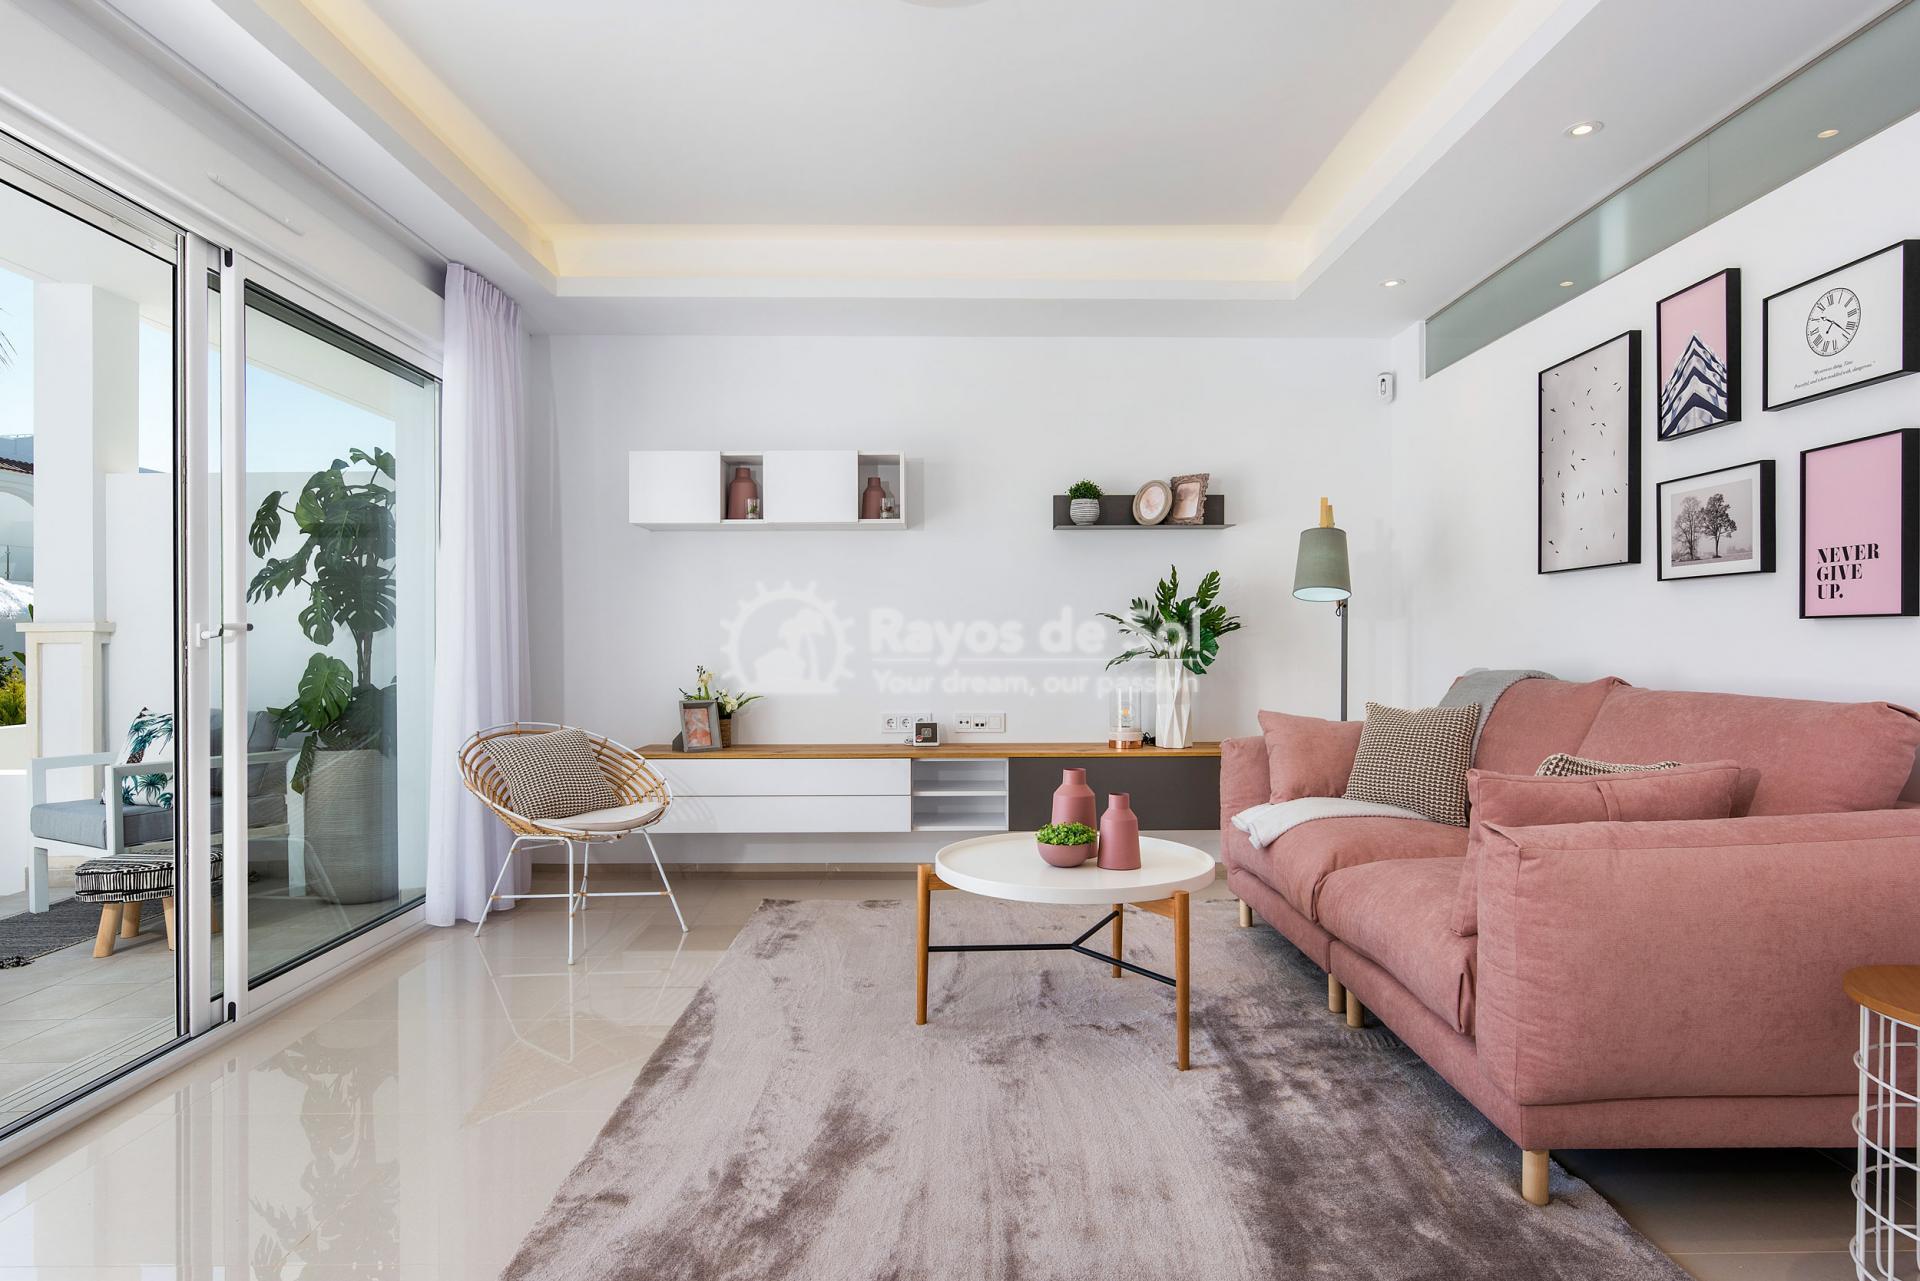 Ground floor apartment  in Doña Pepa, Ciudad Quesada, Costa Blanca (Allegra-olivos-bg-3-2) - 8